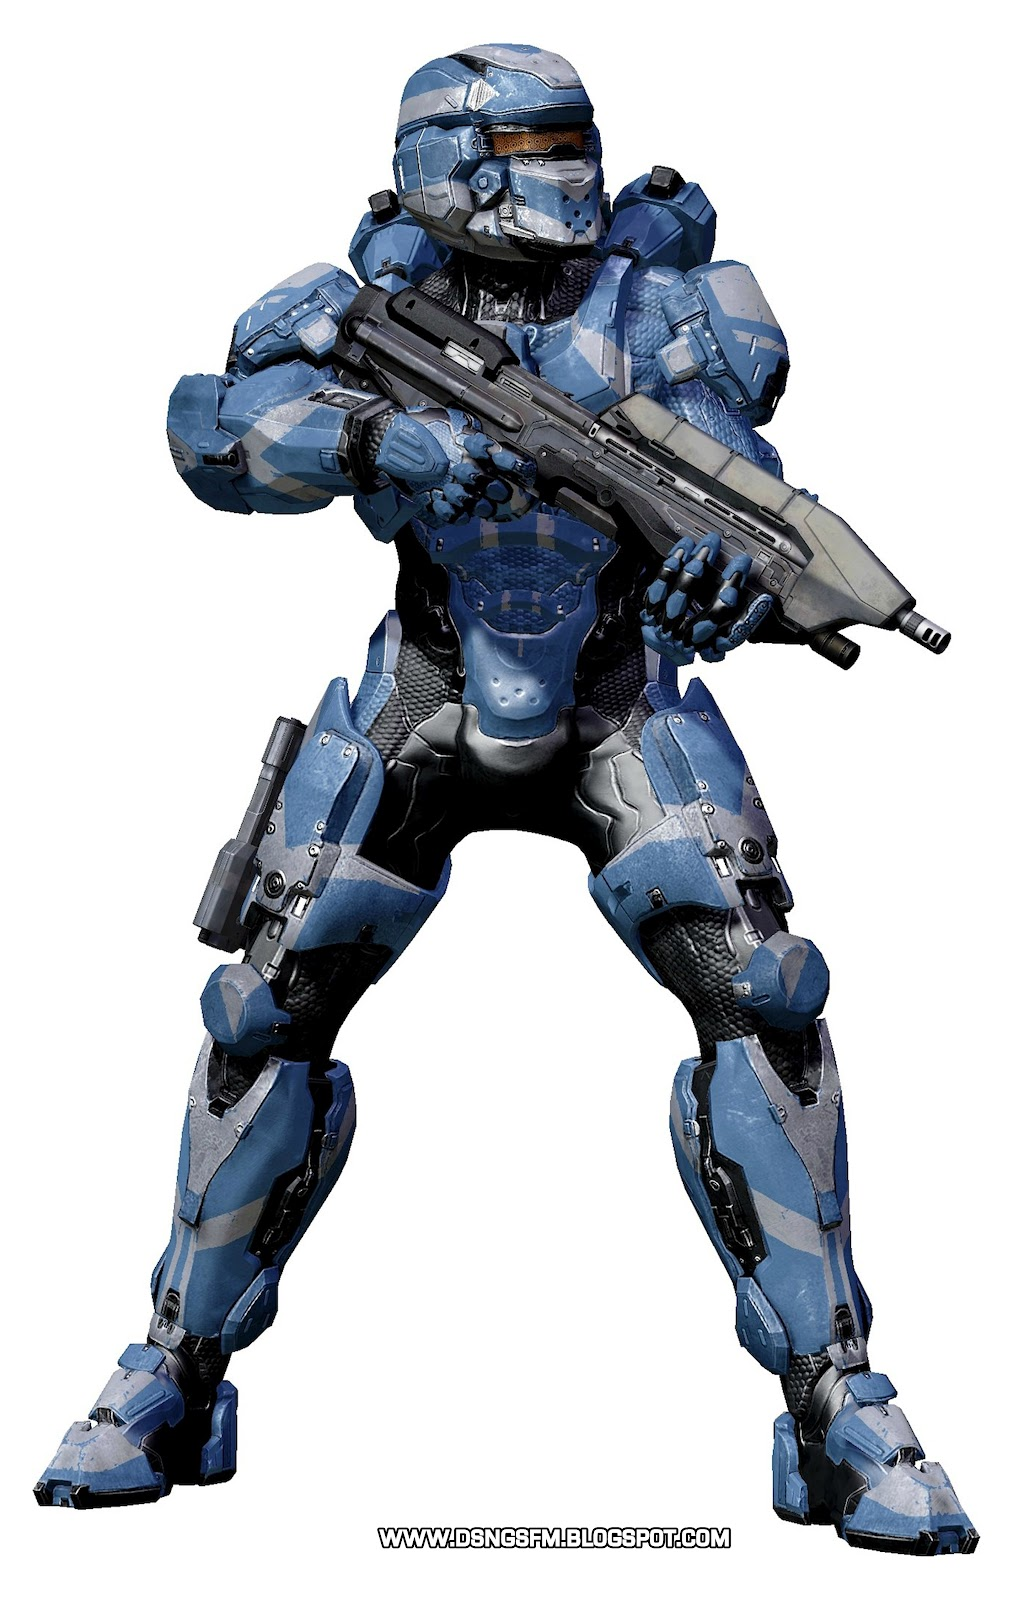 Dsng S Sci Fi Megaverse September 2012